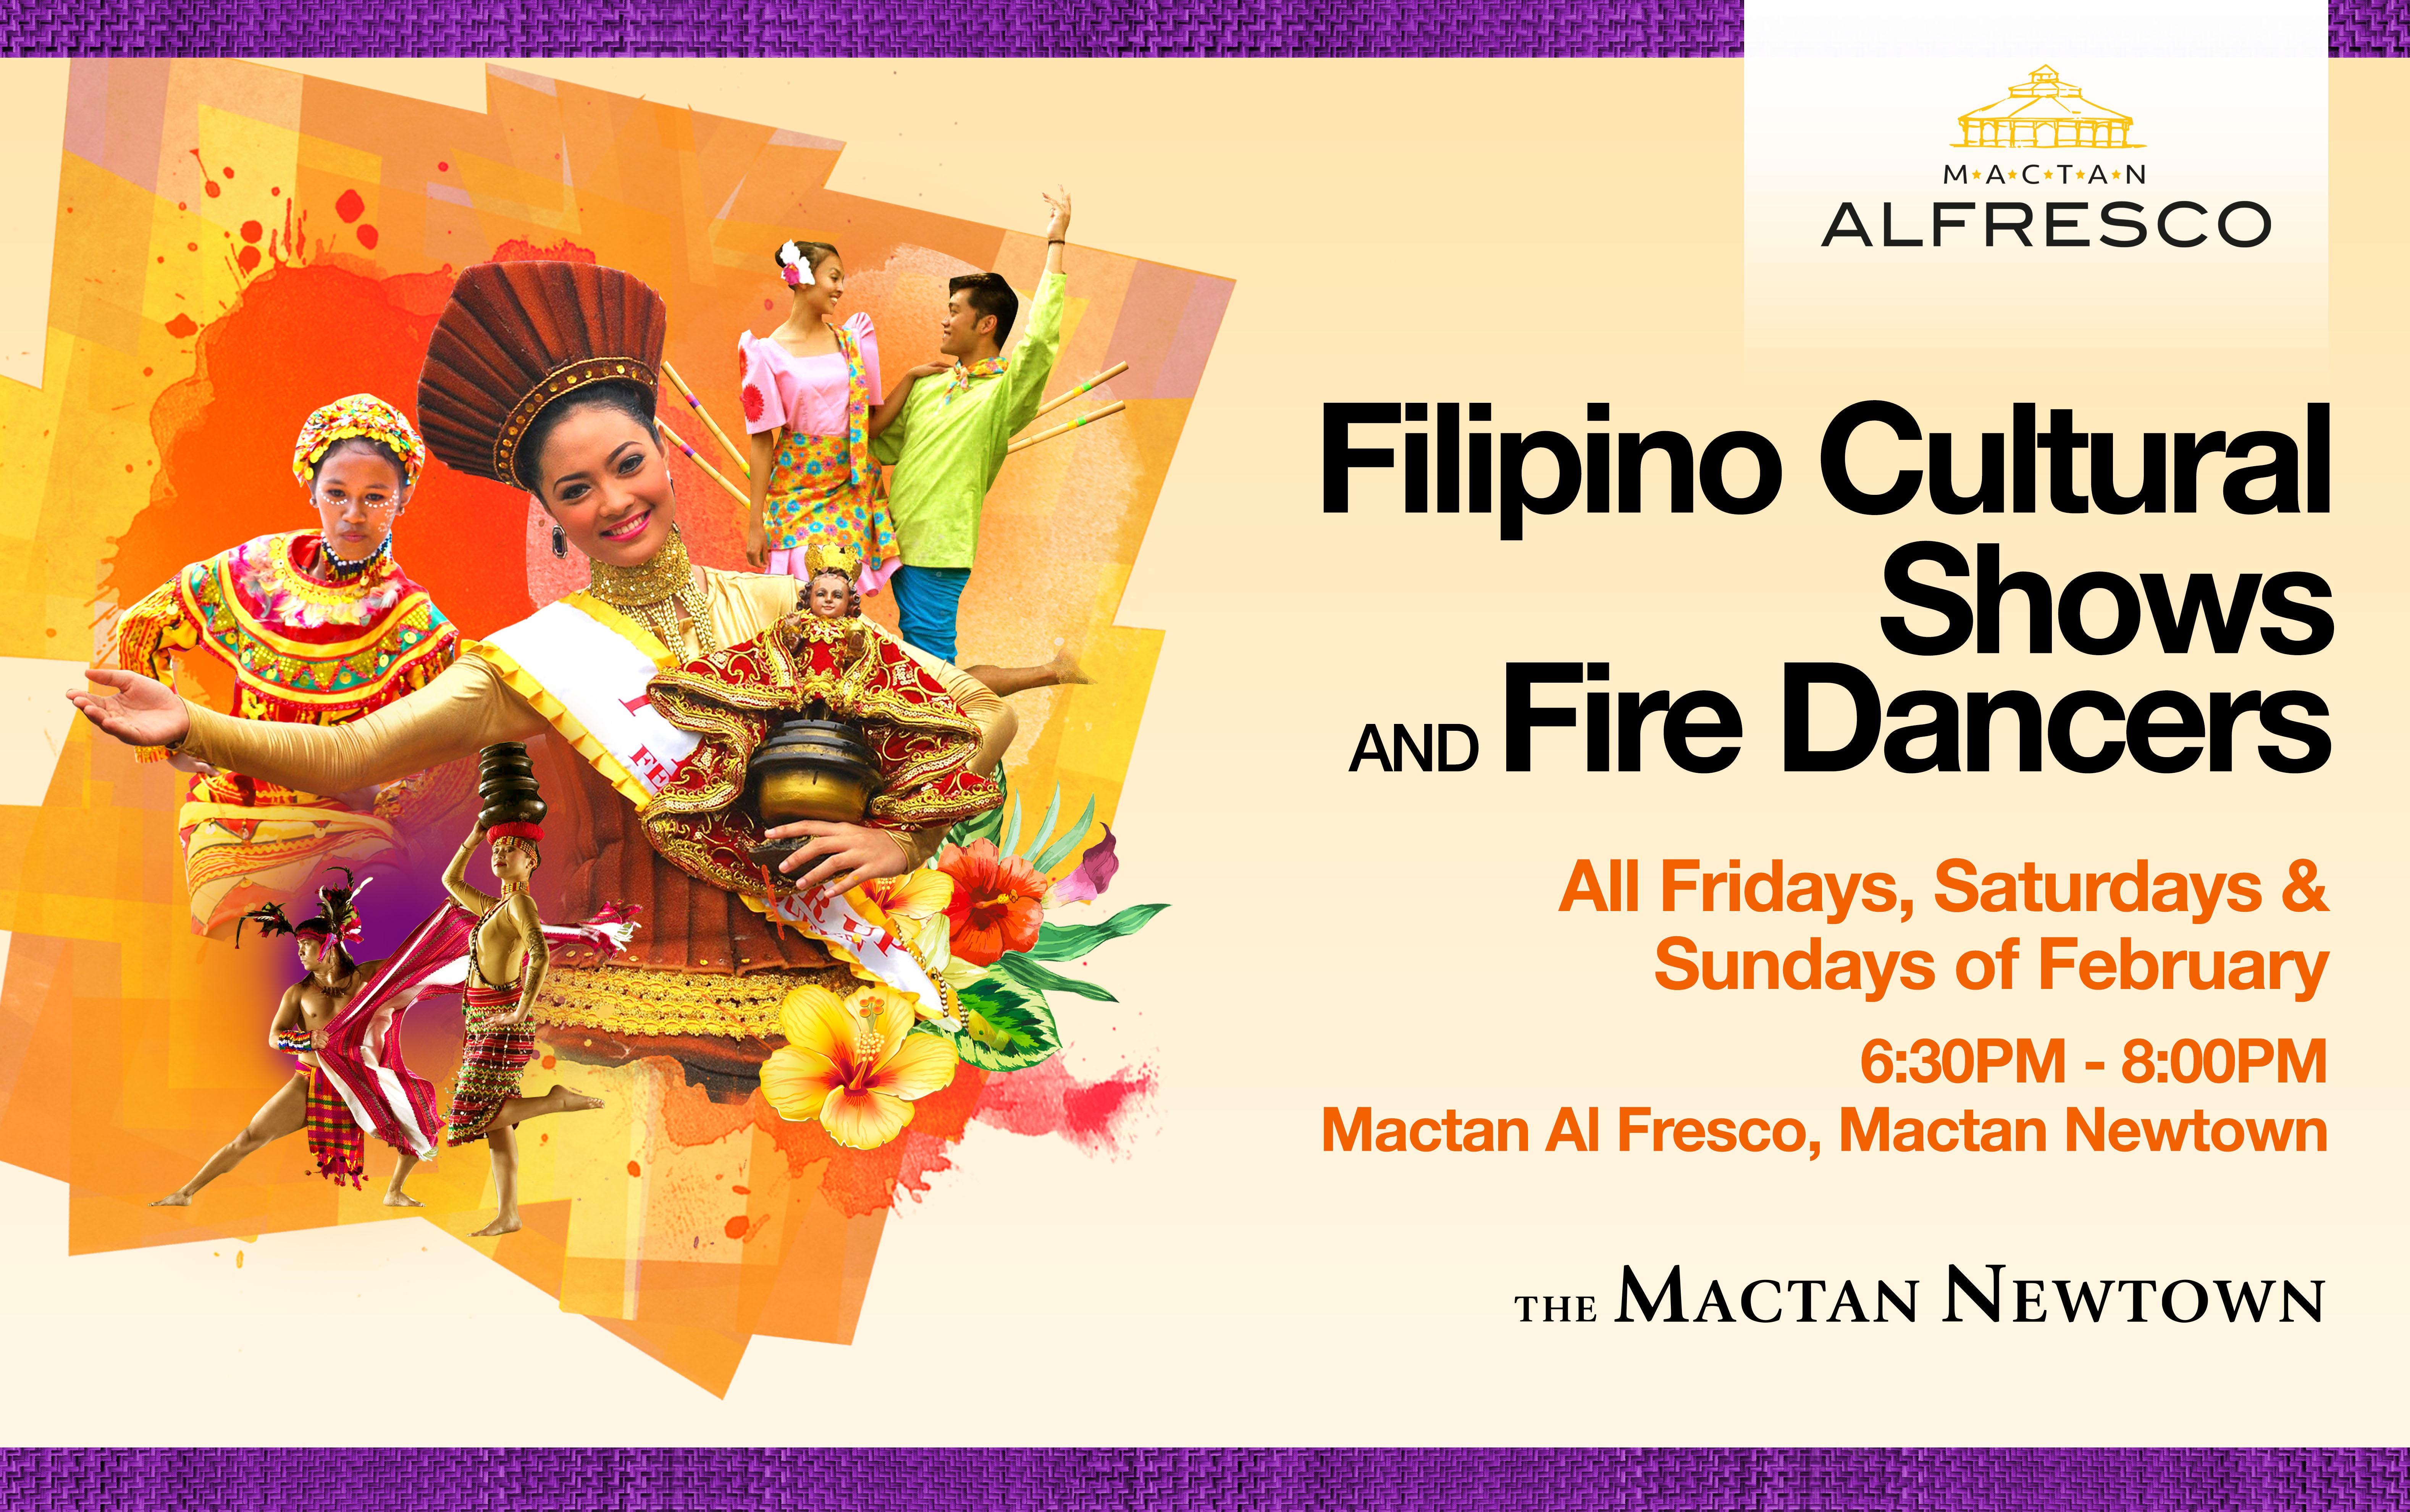 Mactan Newtown Cebu February cultural performances